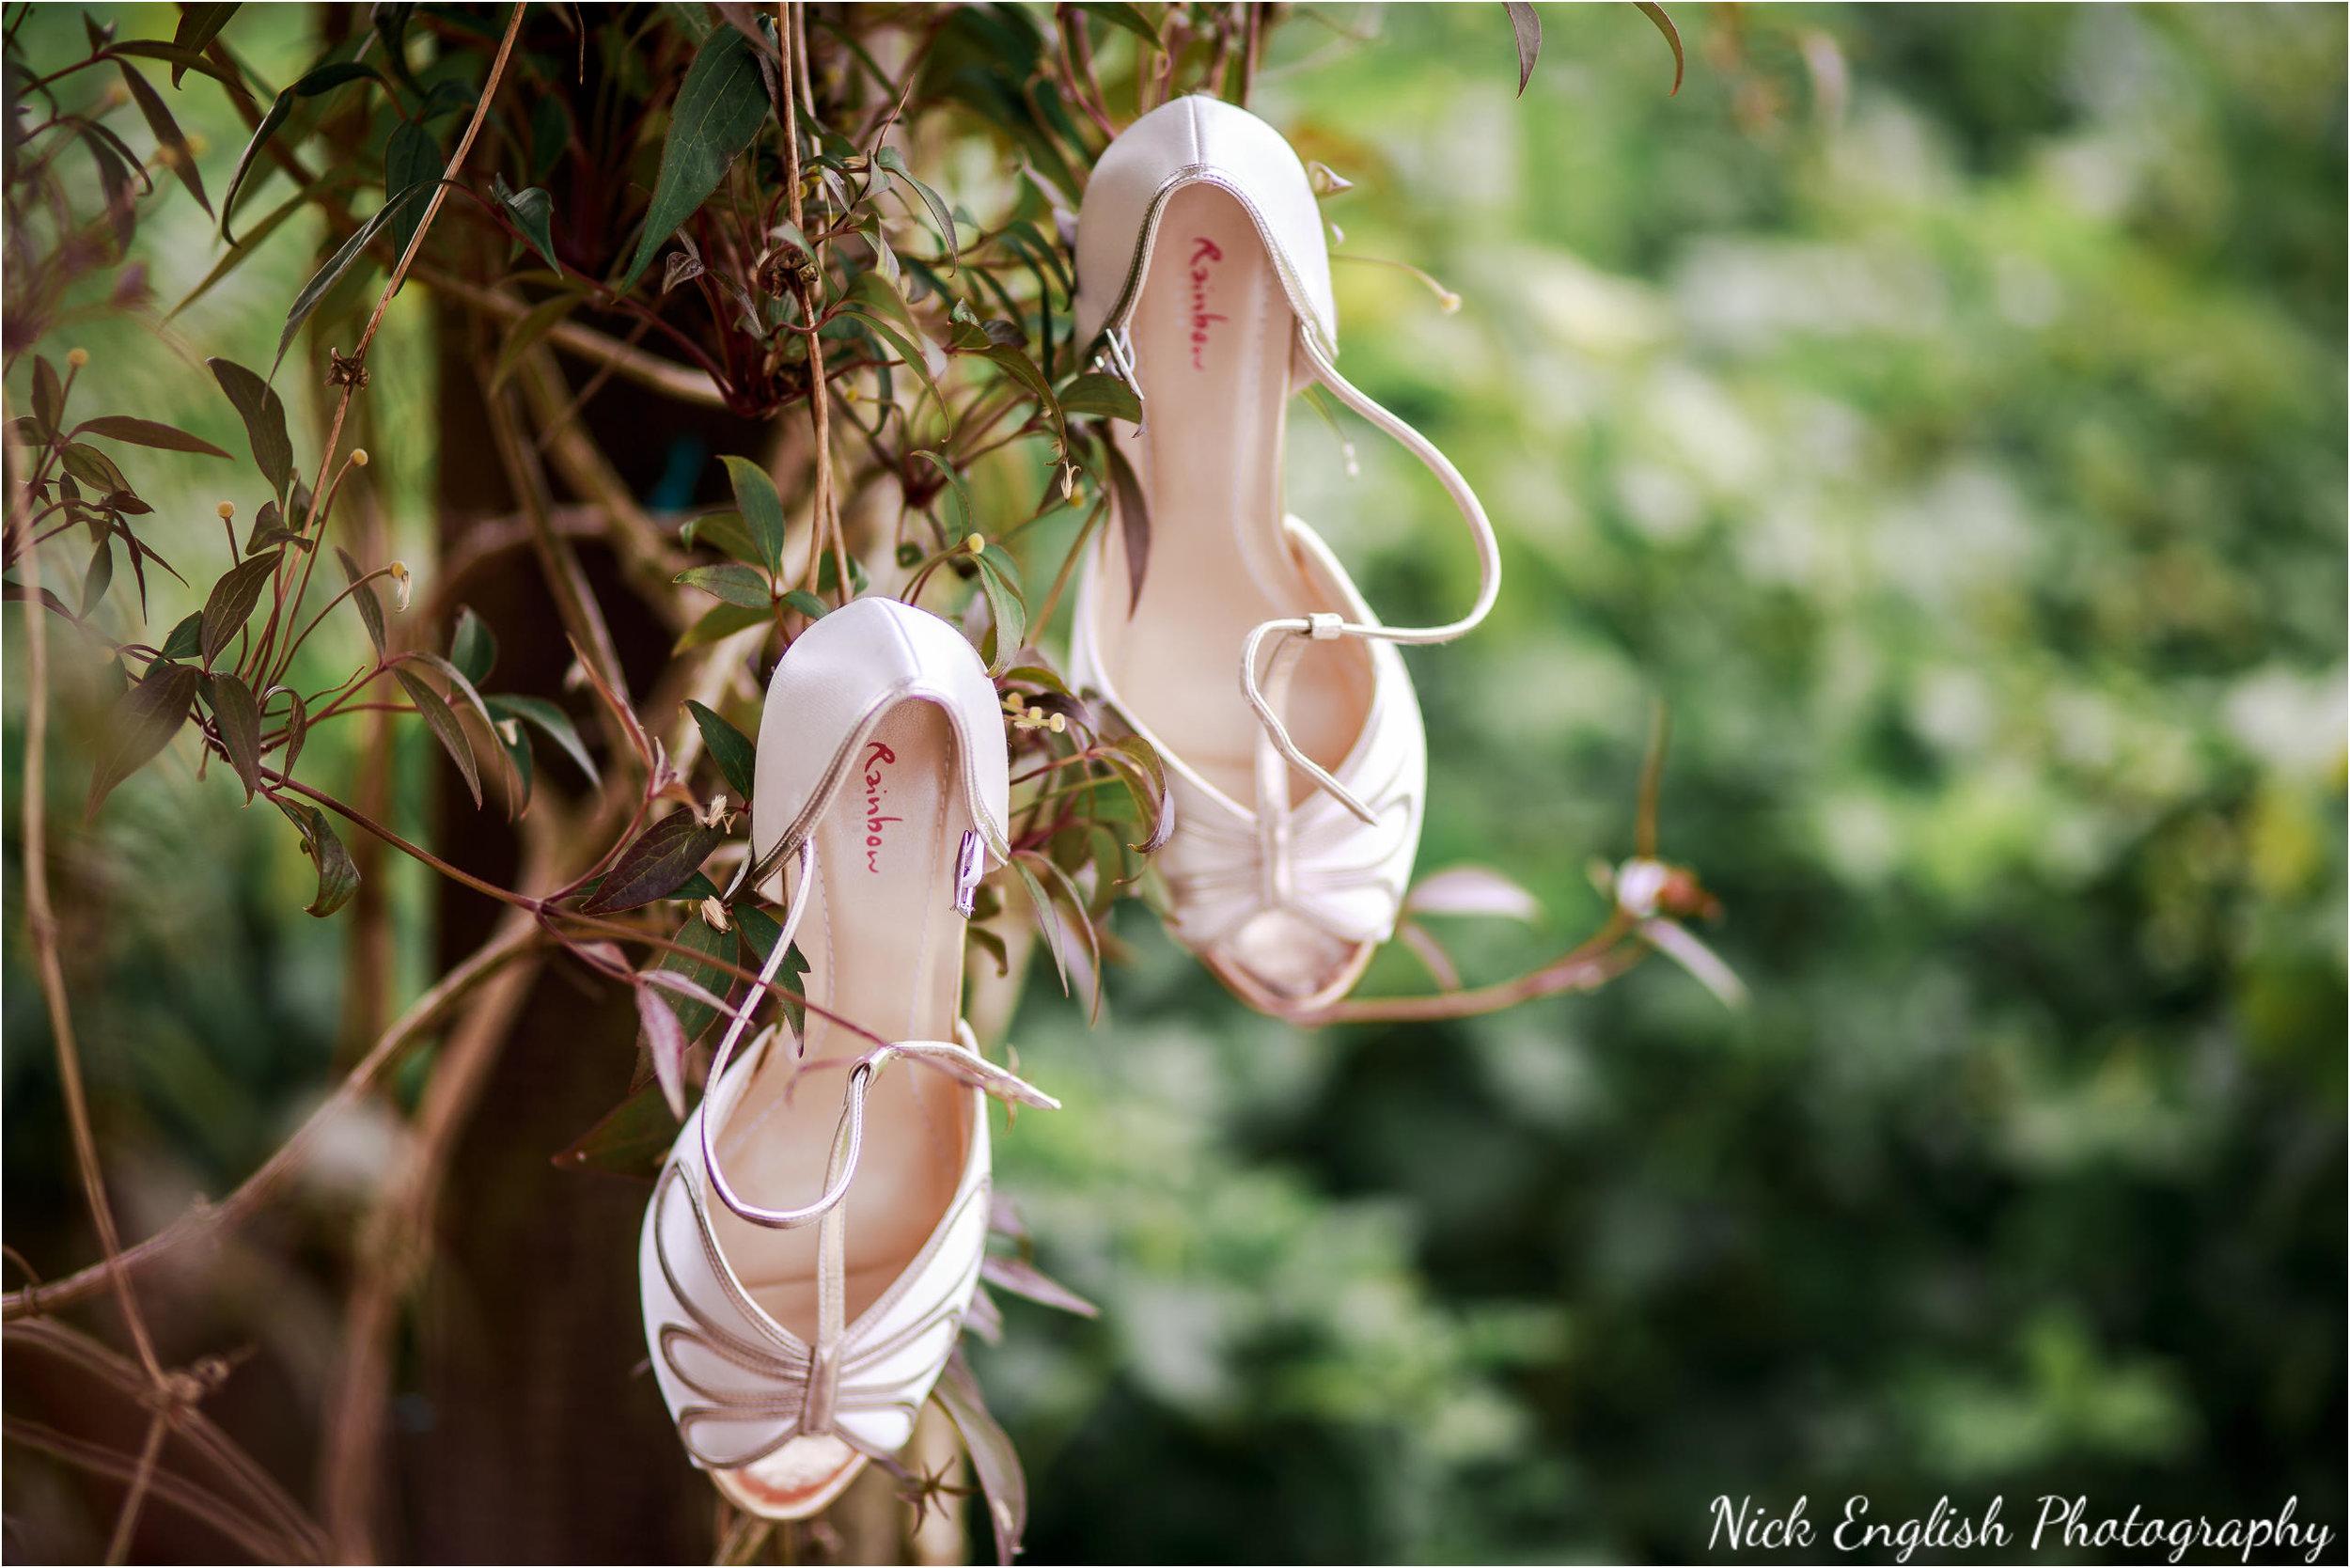 Emily David Wedding Photographs at Barton Grange Preston by Nick English Photography 15jpg.jpeg